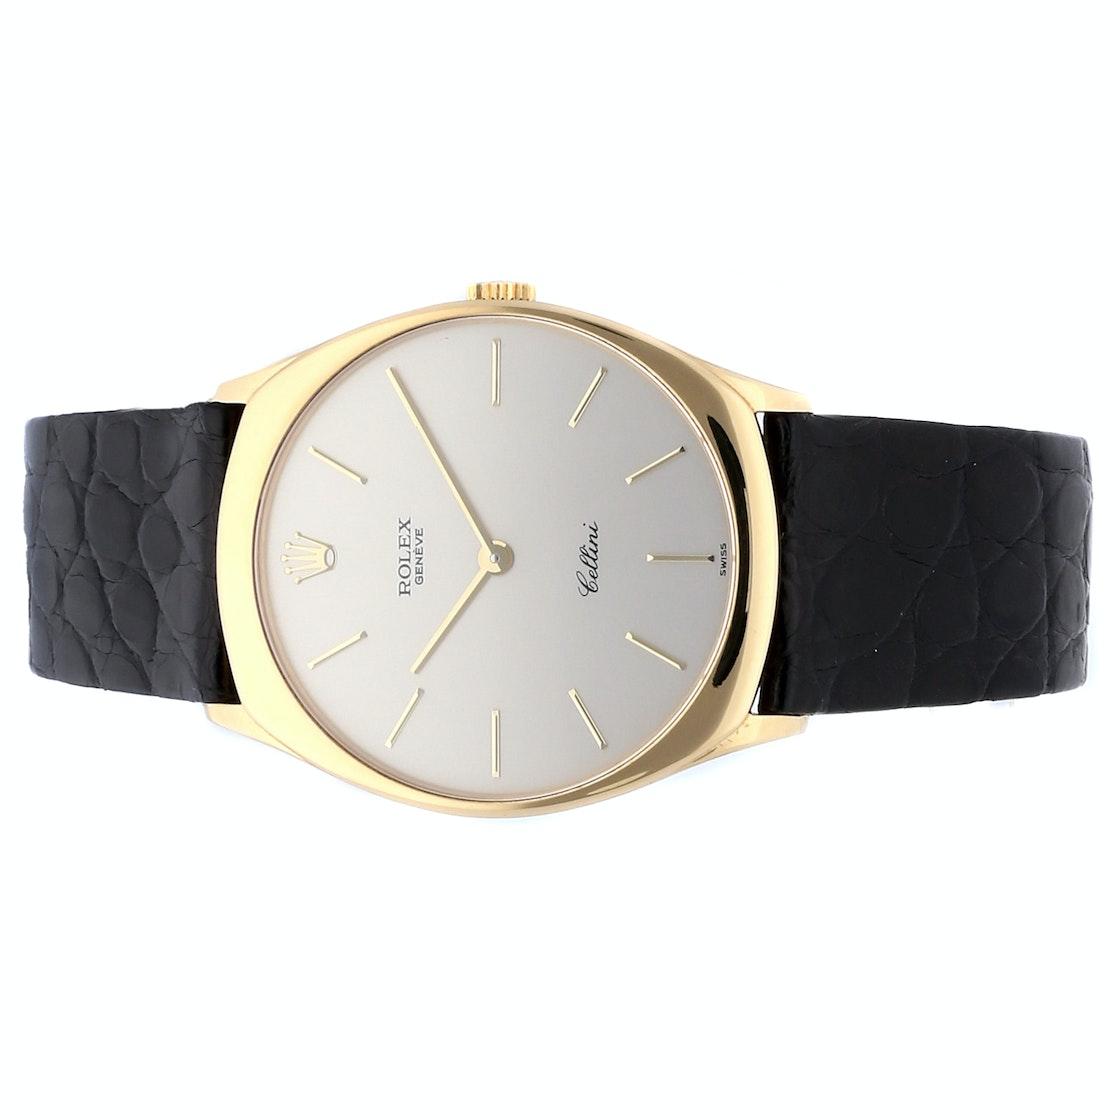 Rolex Cellini 5109